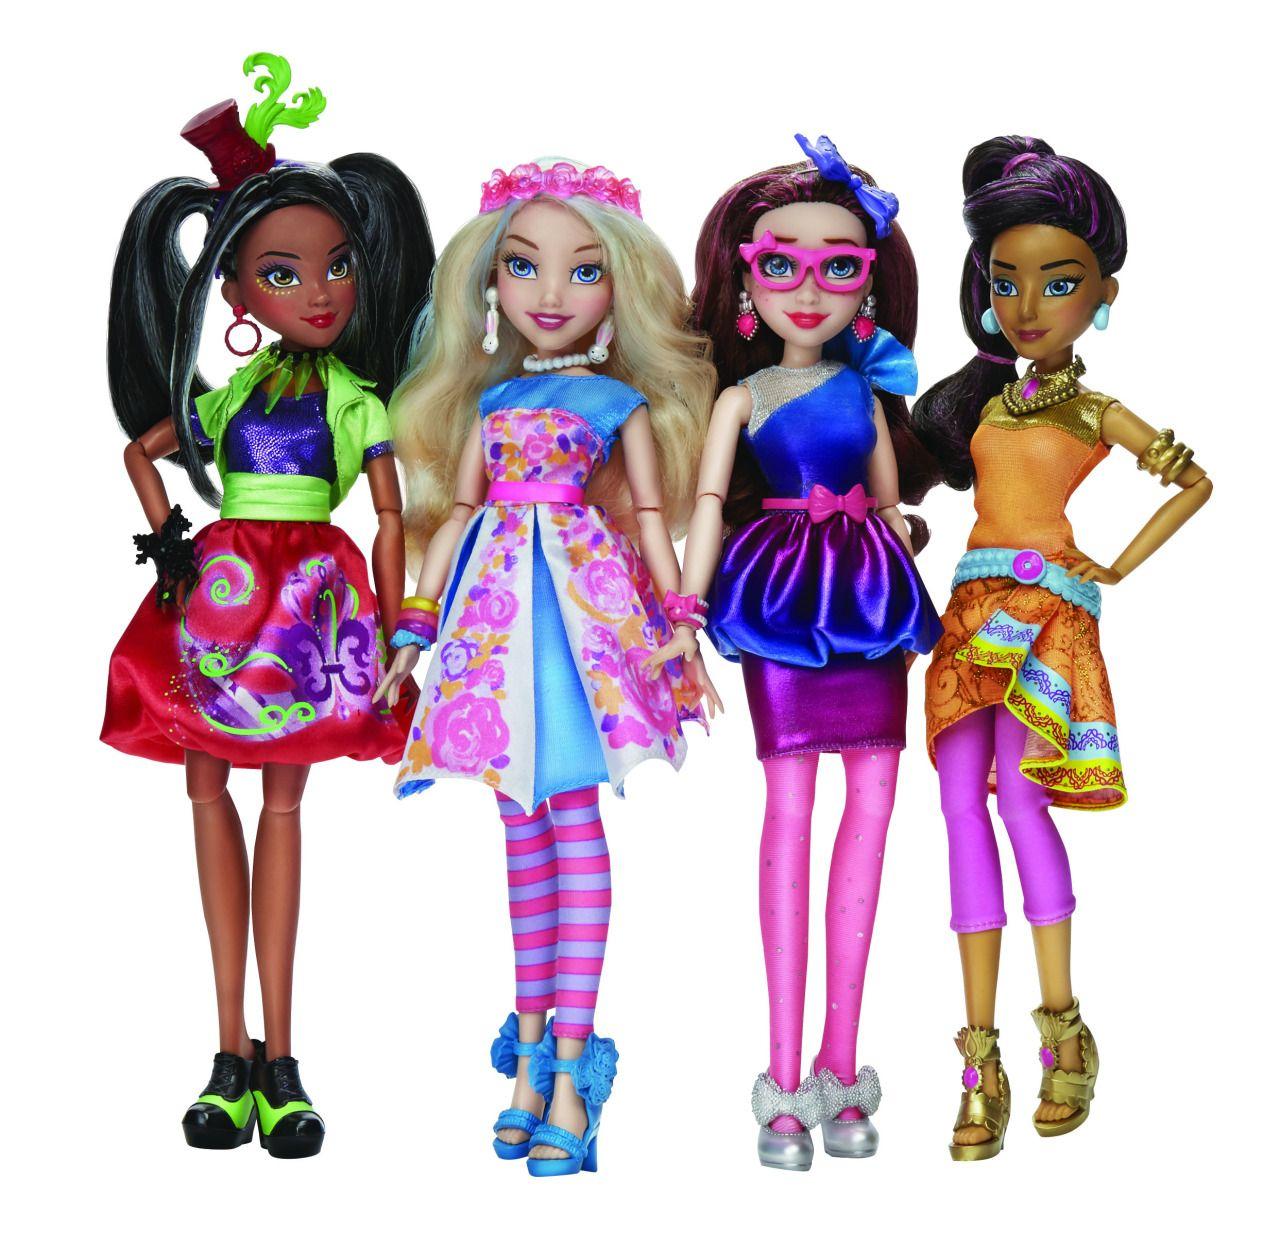 Tumblr O2g47kzdwz1qfw5two1 1280 Jpg 1 280 1 249 Pixels Disney Descendants Dolls American Girl Doll American Girl Doll Hairstyles